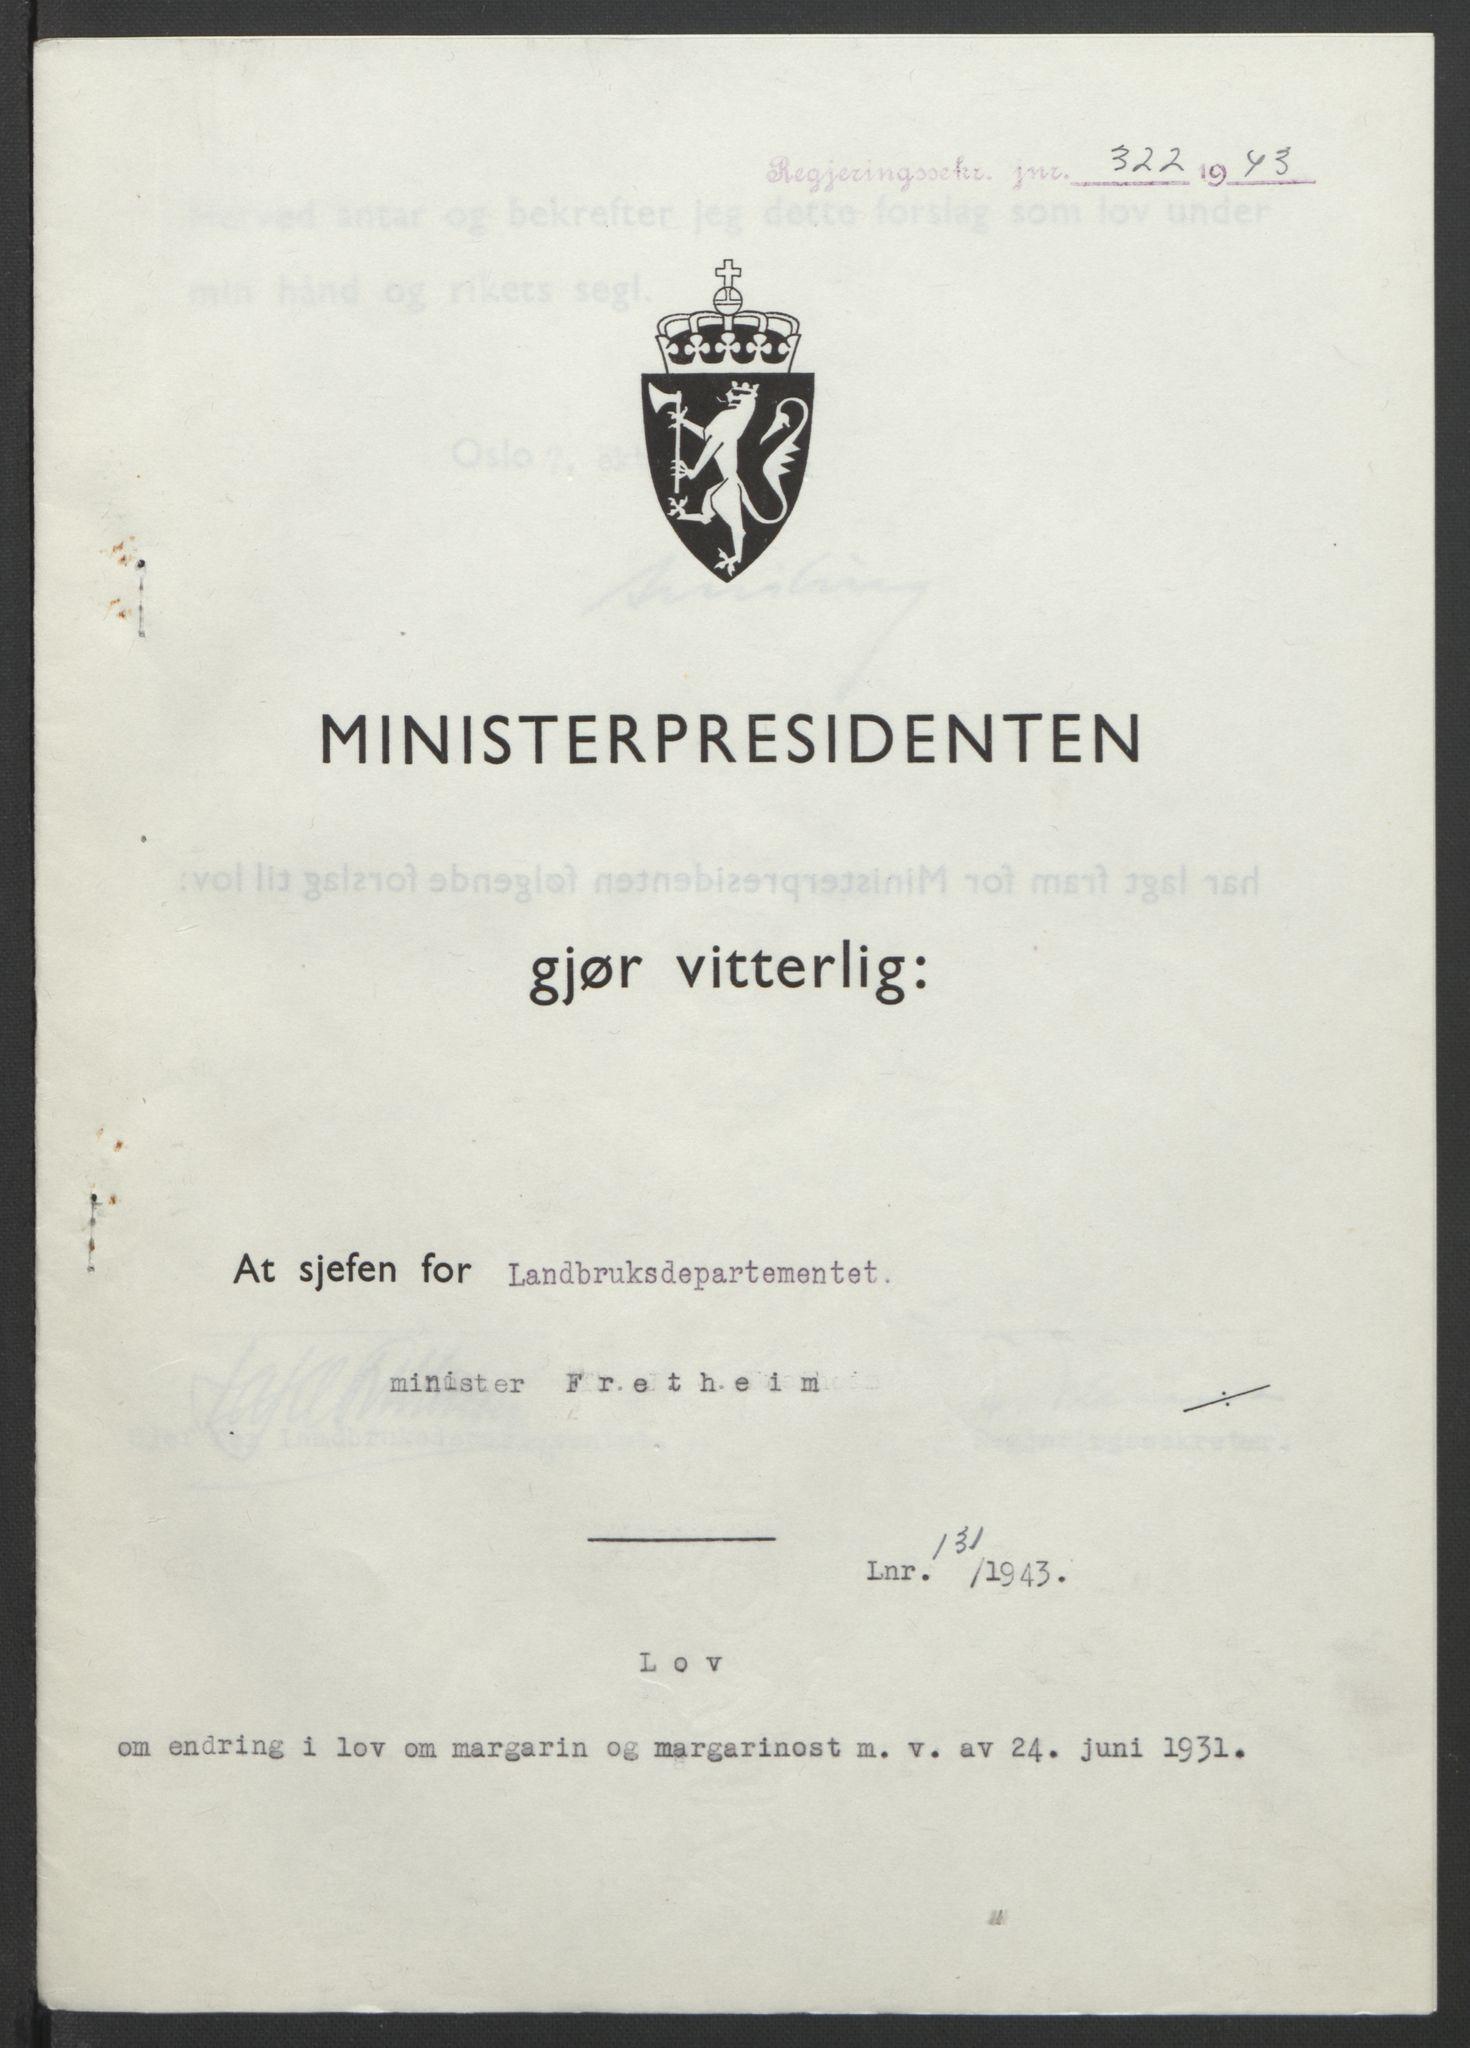 RA, NS-administrasjonen 1940-1945 (Statsrådsekretariatet, de kommisariske statsråder mm), D/Db/L0099: Lover, 1943, s. 612